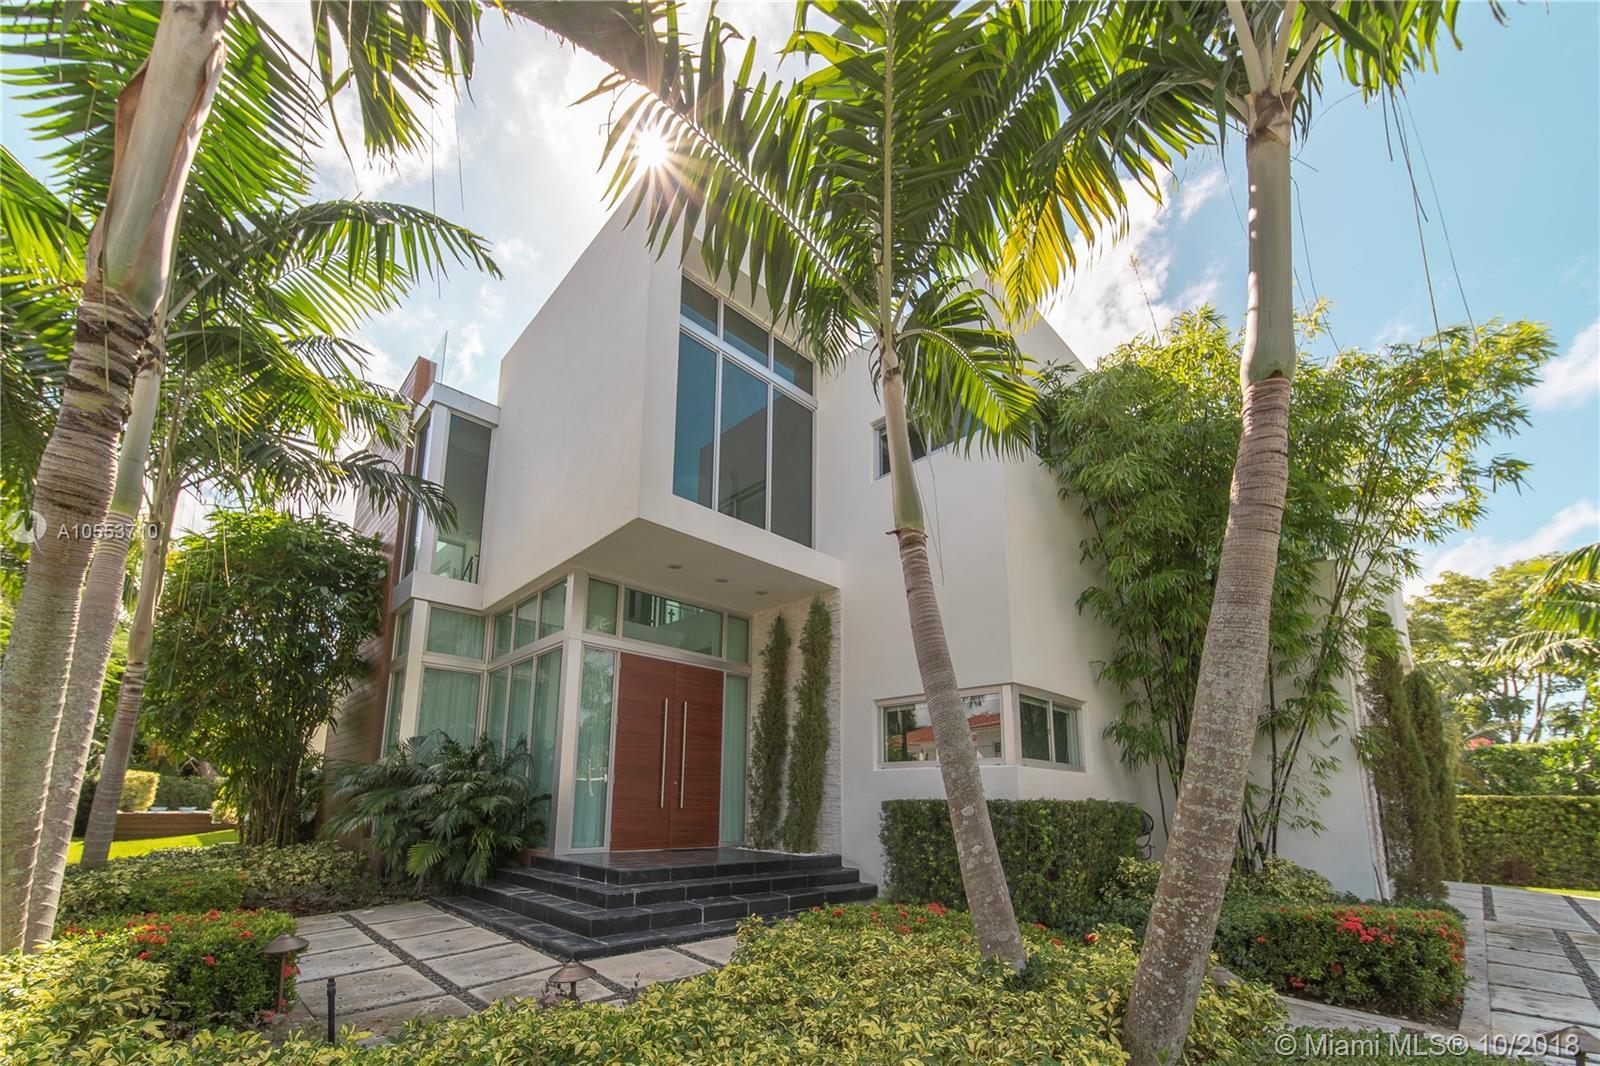 120 N Hibiscus Dr Luxury Real Estate